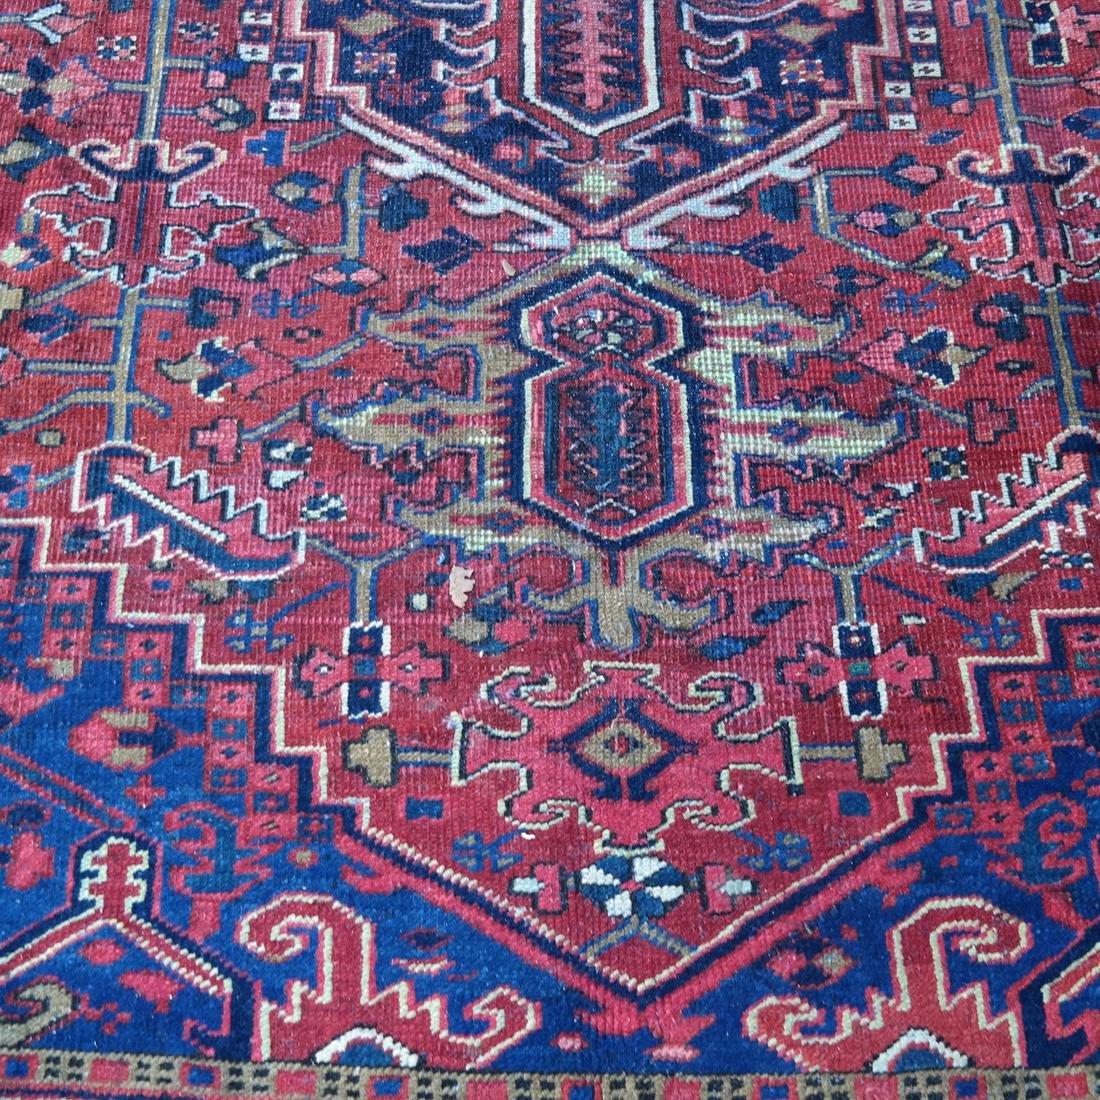 Antique Iranian Heriz Carpet, 9 x 12 - 3